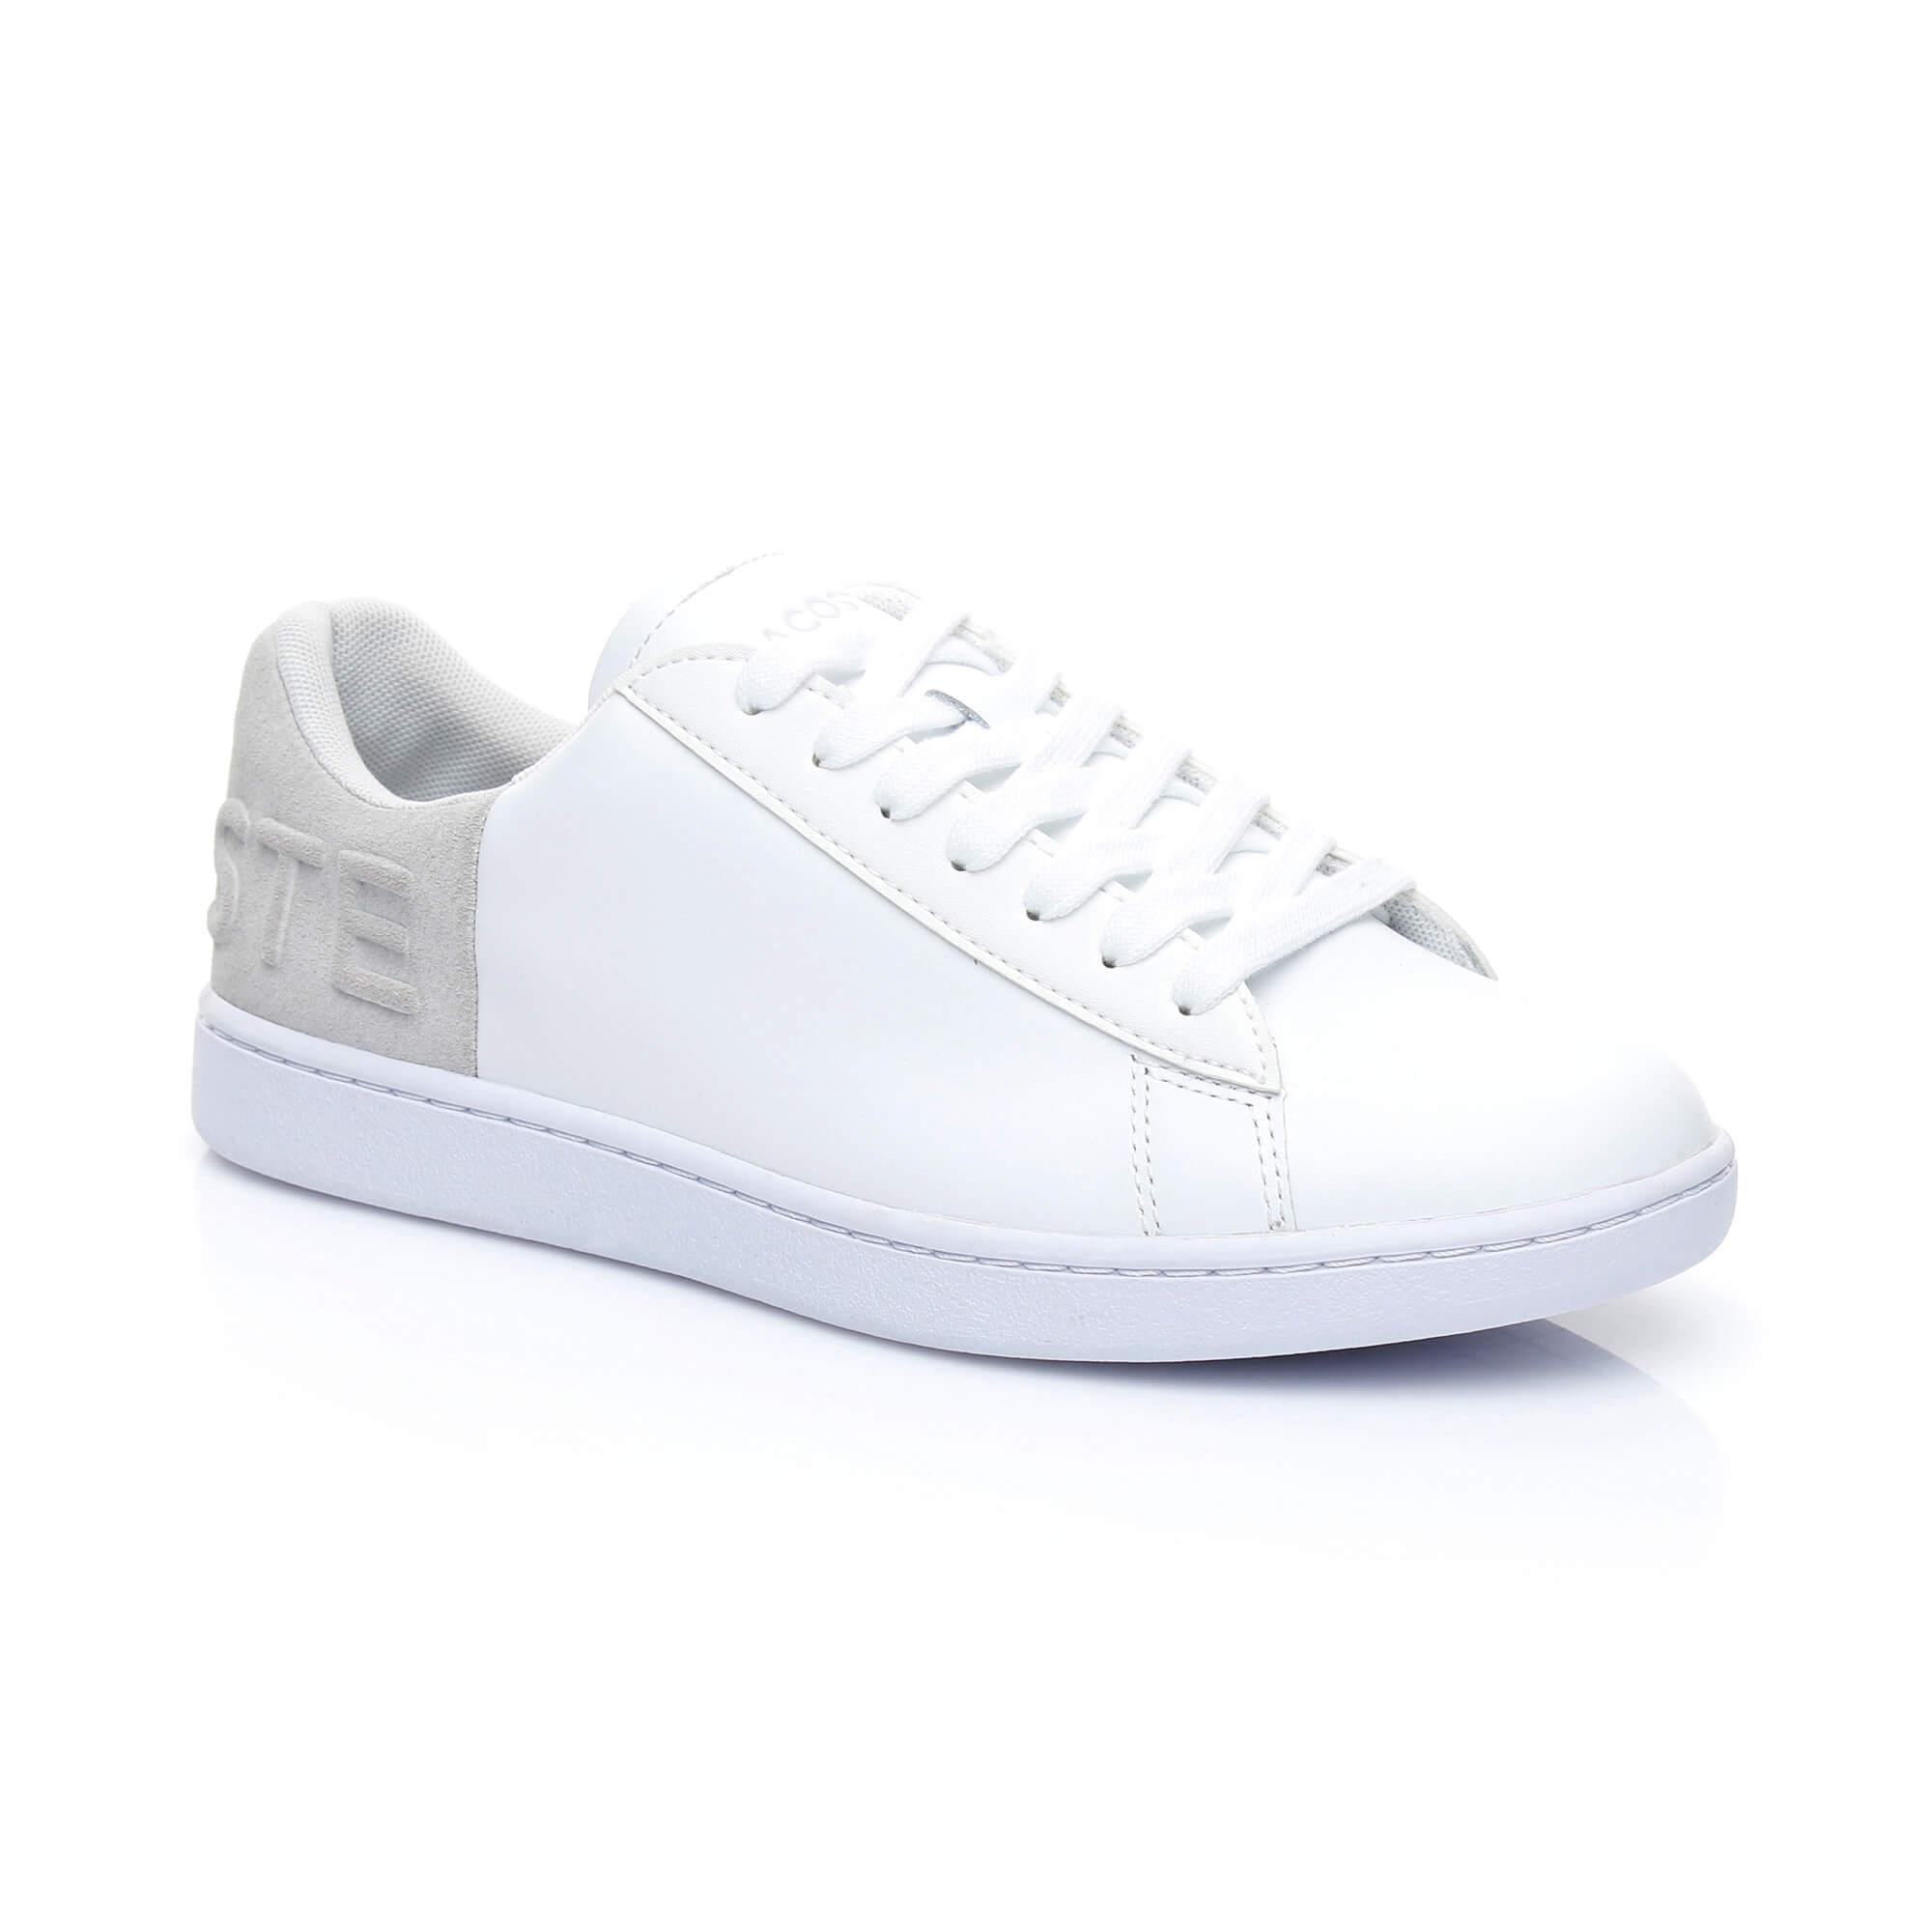 Lacoste Carnaby Evo 318 3 Damskie Skórzane Sneakersy